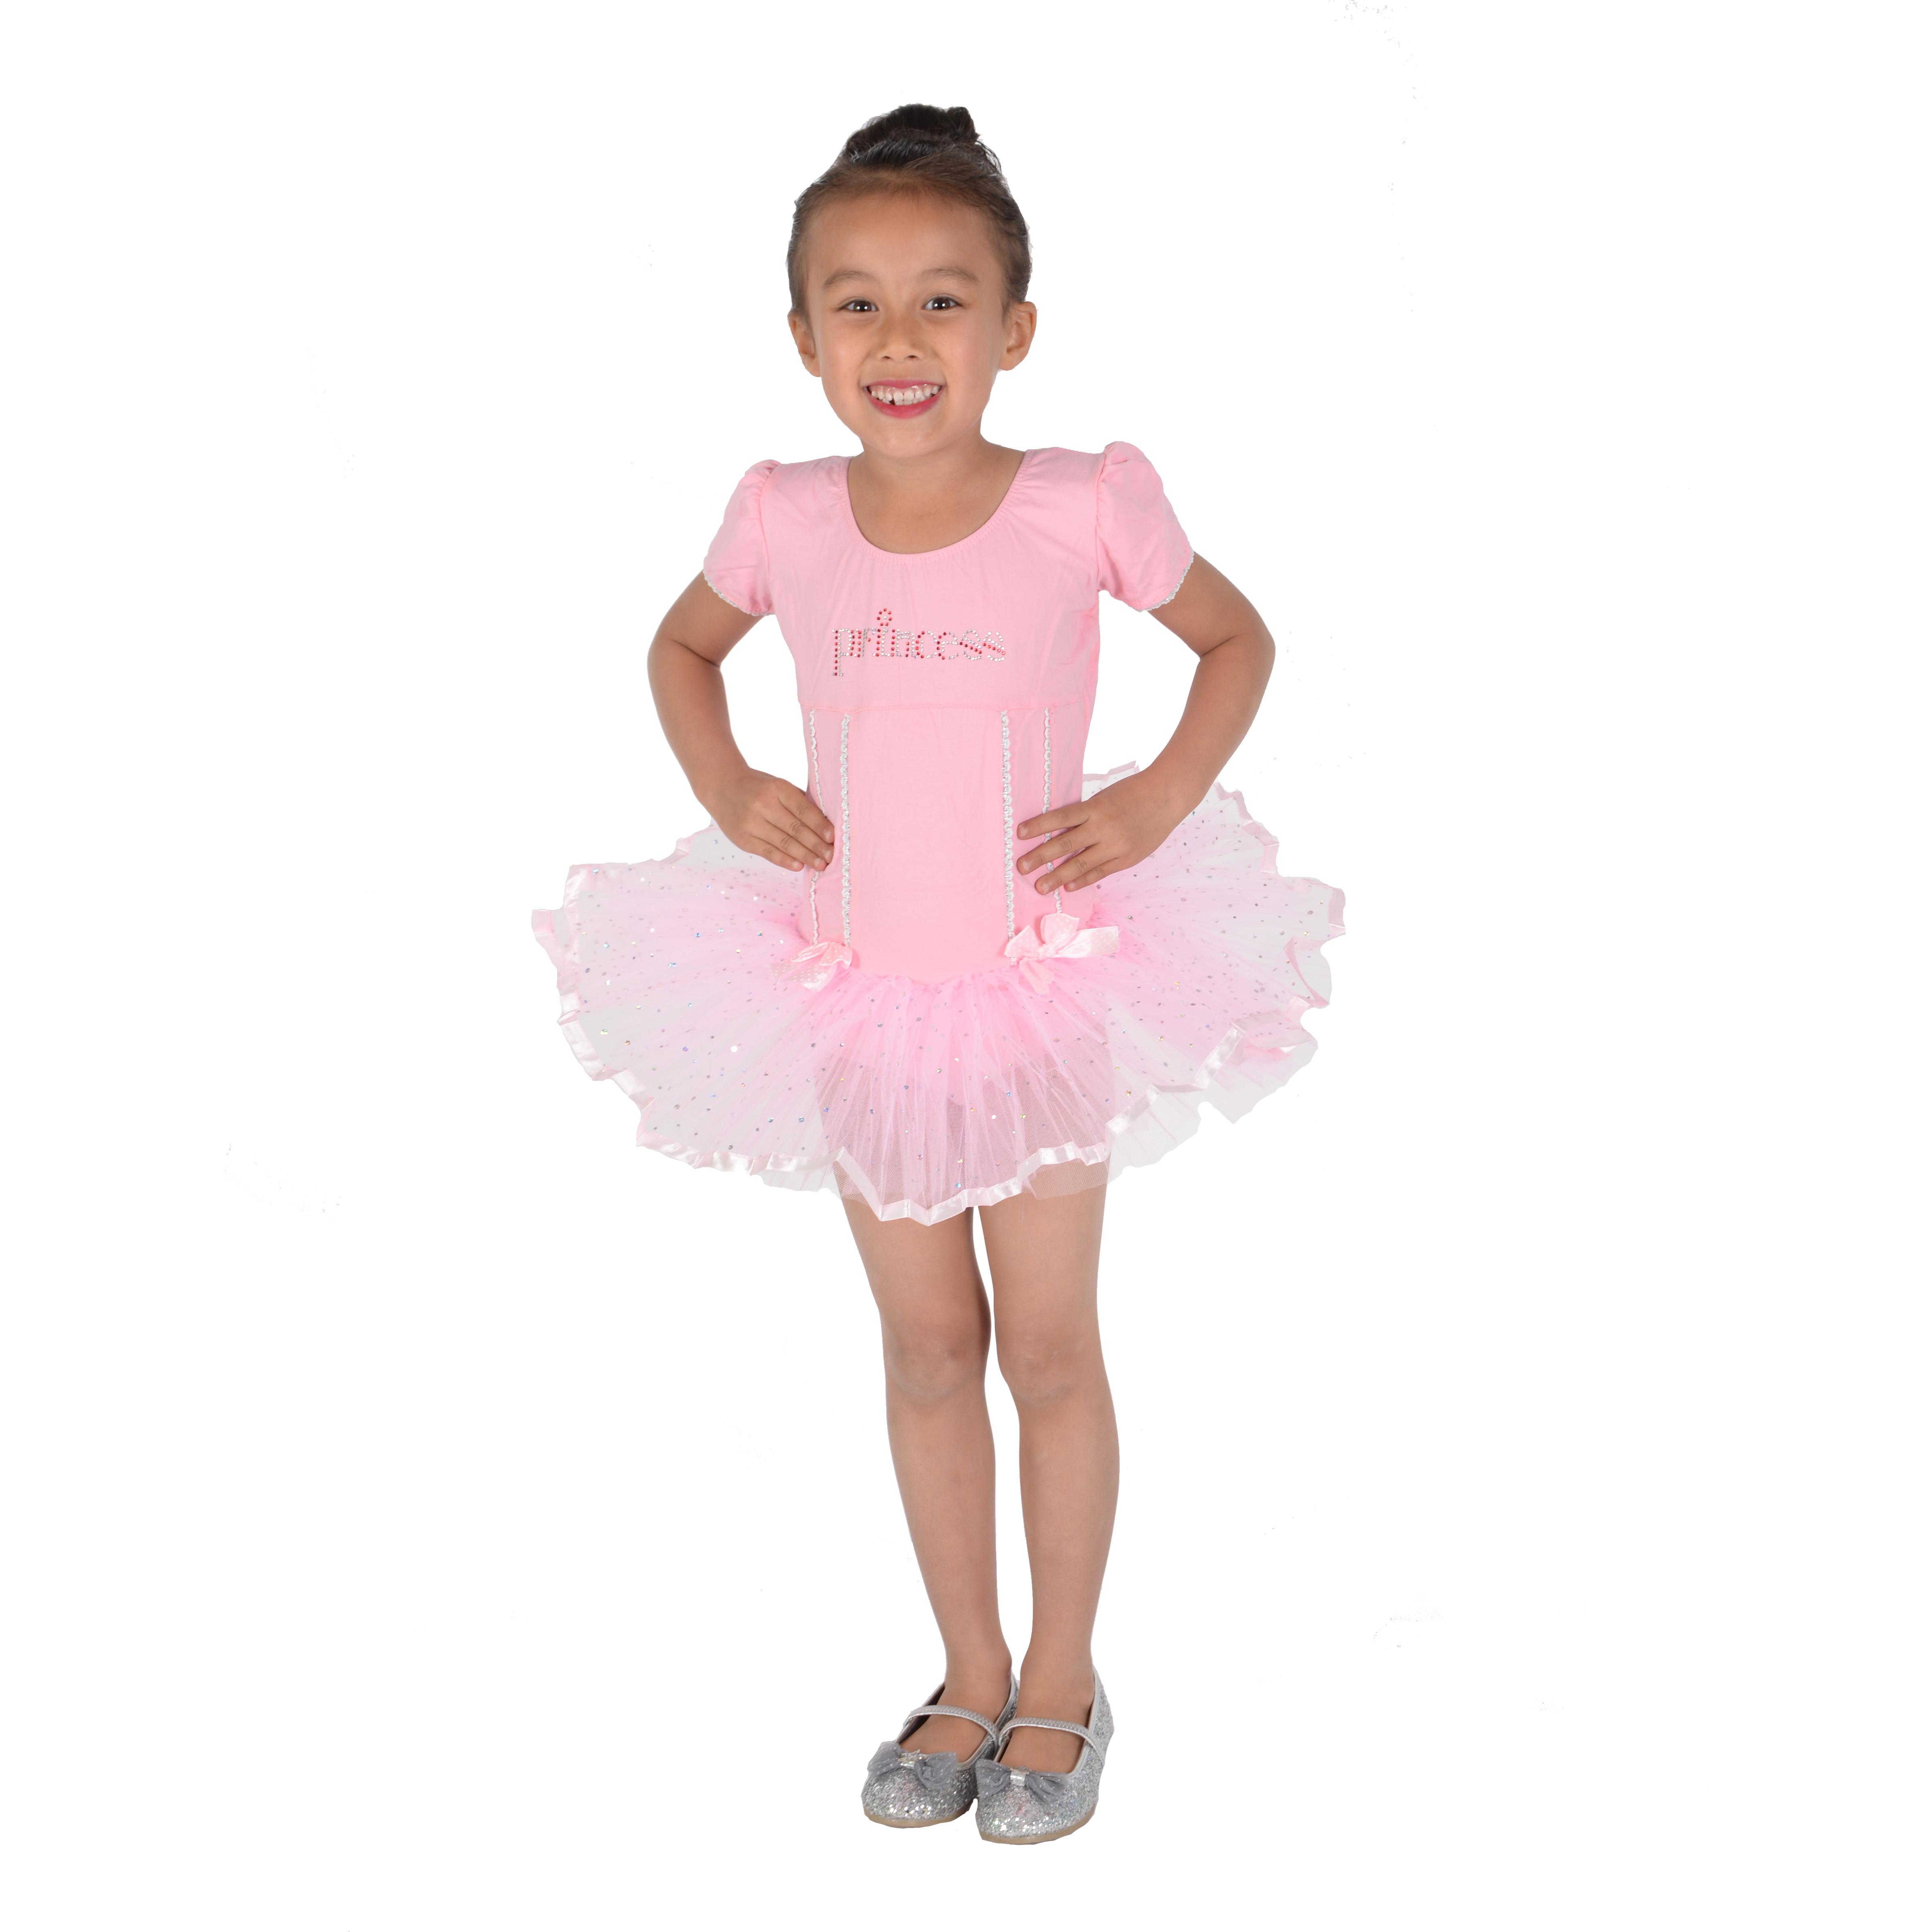 Girls Ballet Dress Dance Tutu Dress Pink Red White Ivory 4 5 6 7 8 9 Years